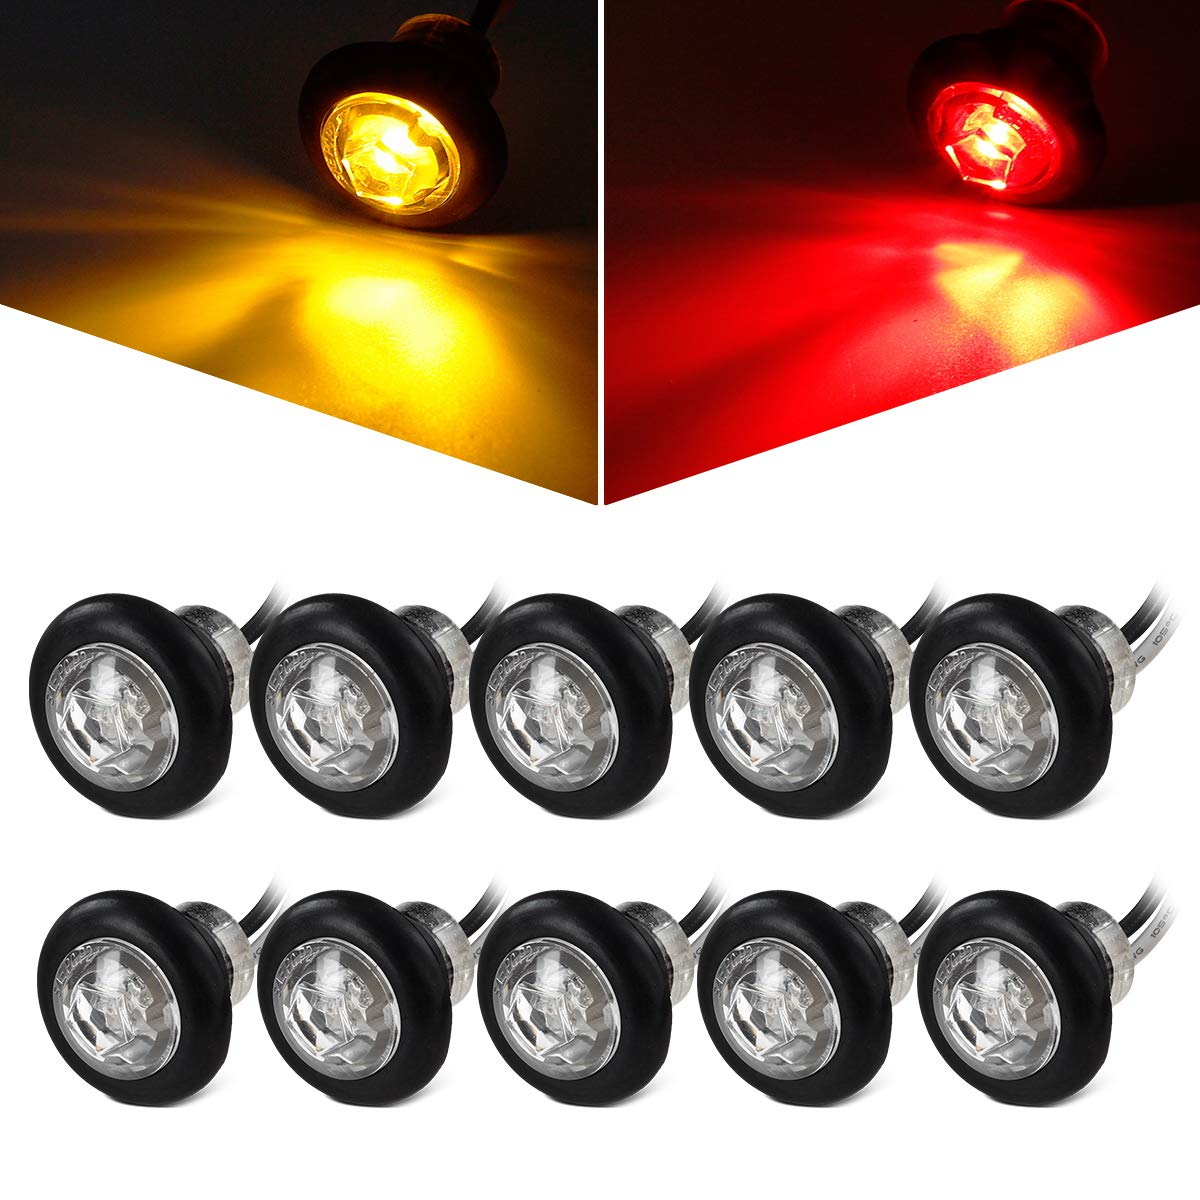 Rubber Grommet w//Plugs Partsam 5x Amber Side indicator LED Marker Clearance Truck Light Lamp 12V